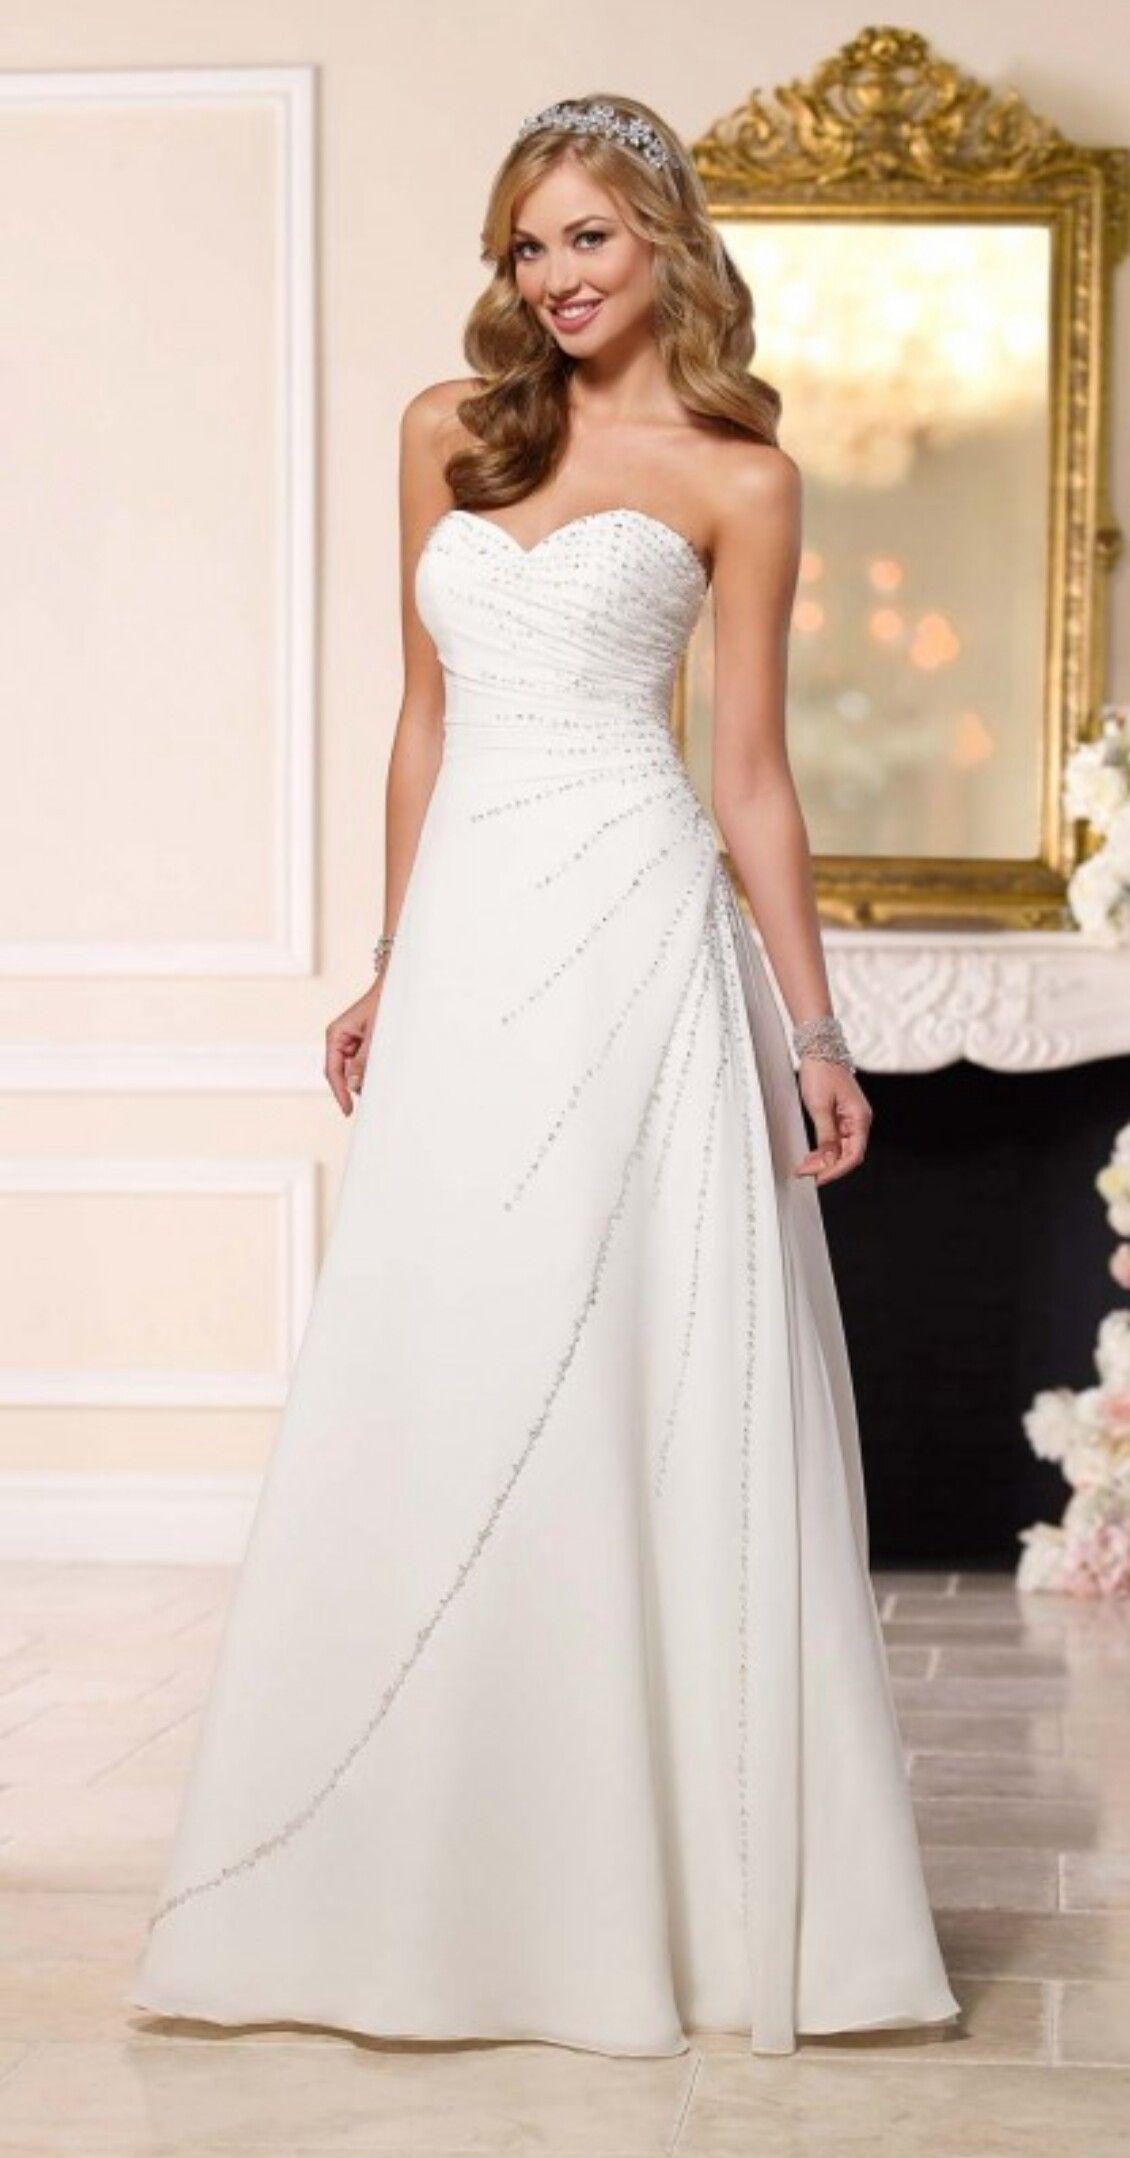 My Wedding Dress D Stella York 6261 Stellayork Wedding Weddingdress Bridal Br Bohemian Style Wedding Dresses Sparkly Wedding Dress Wedding Dresses Beaded